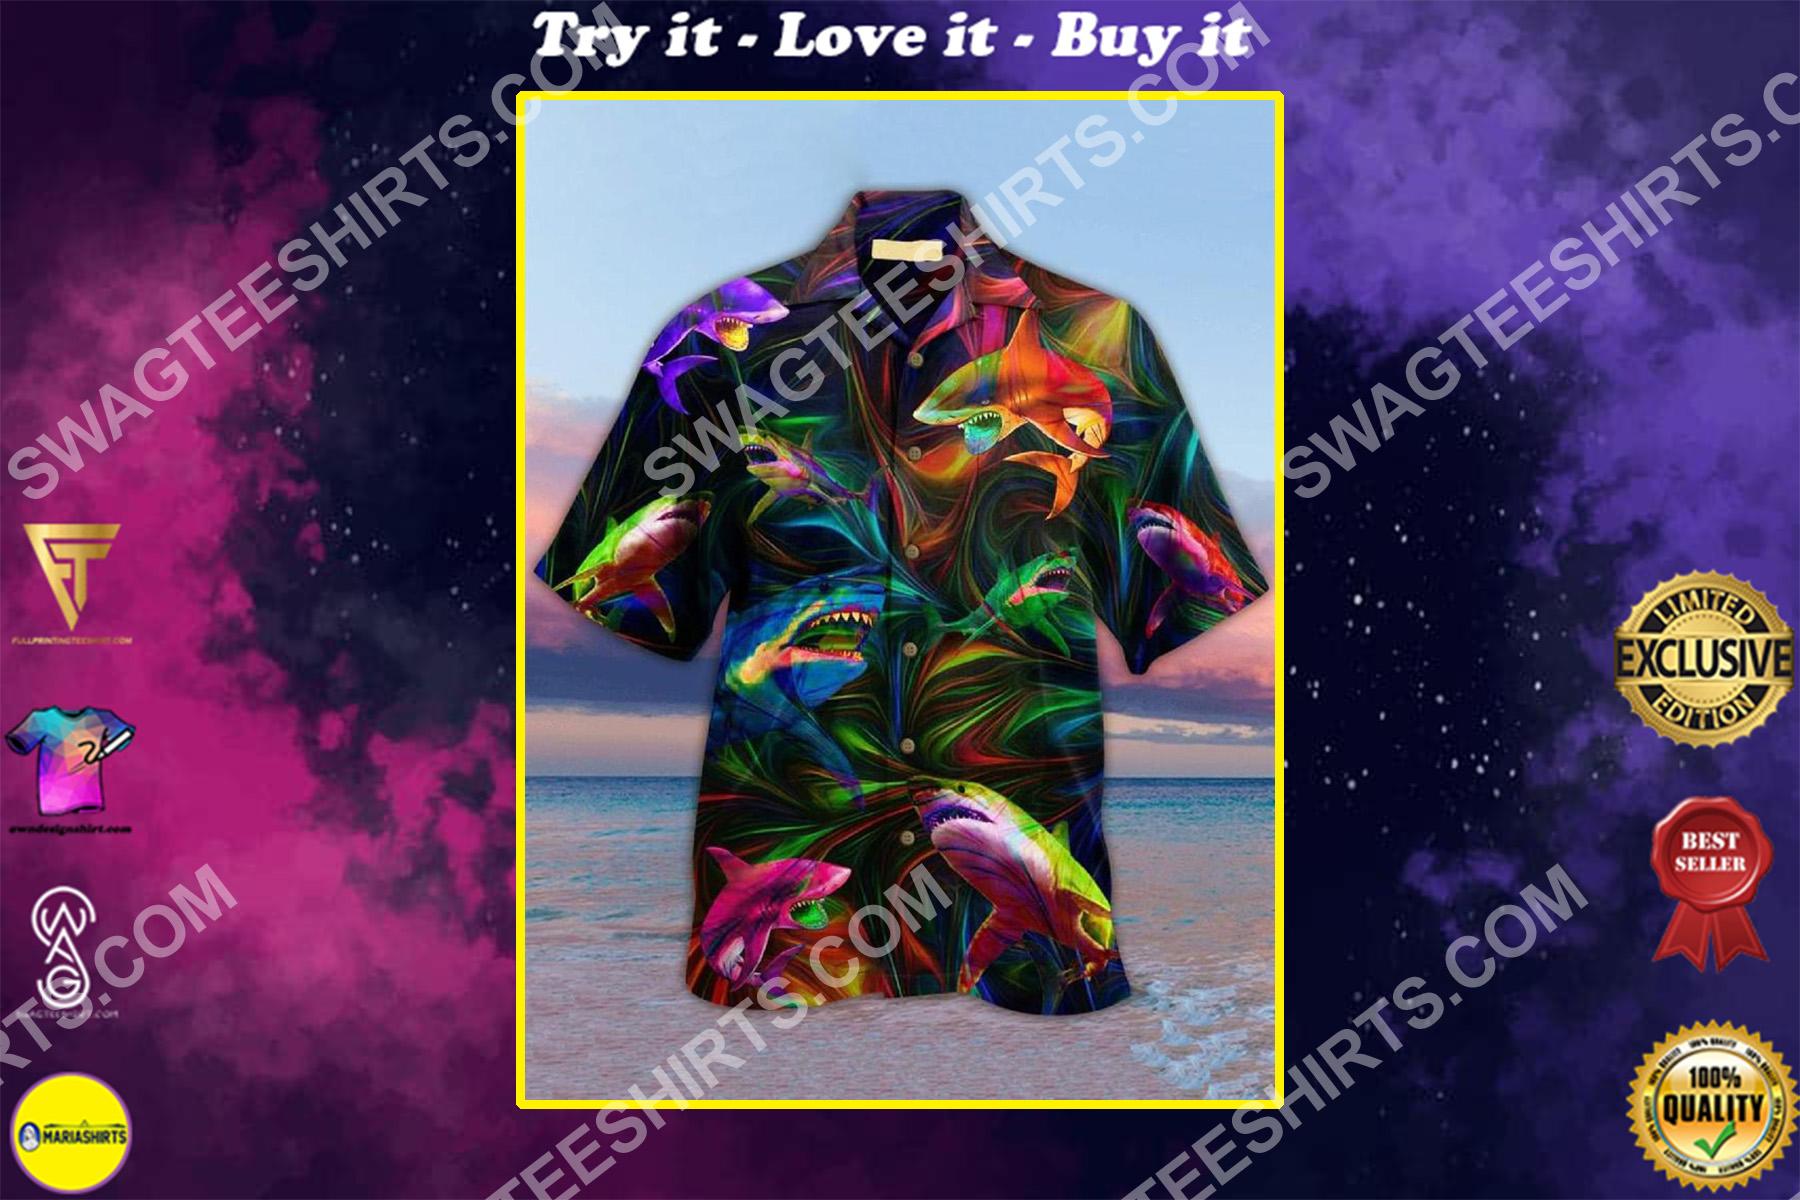 the shark colorful all over printed hawaiian shirt